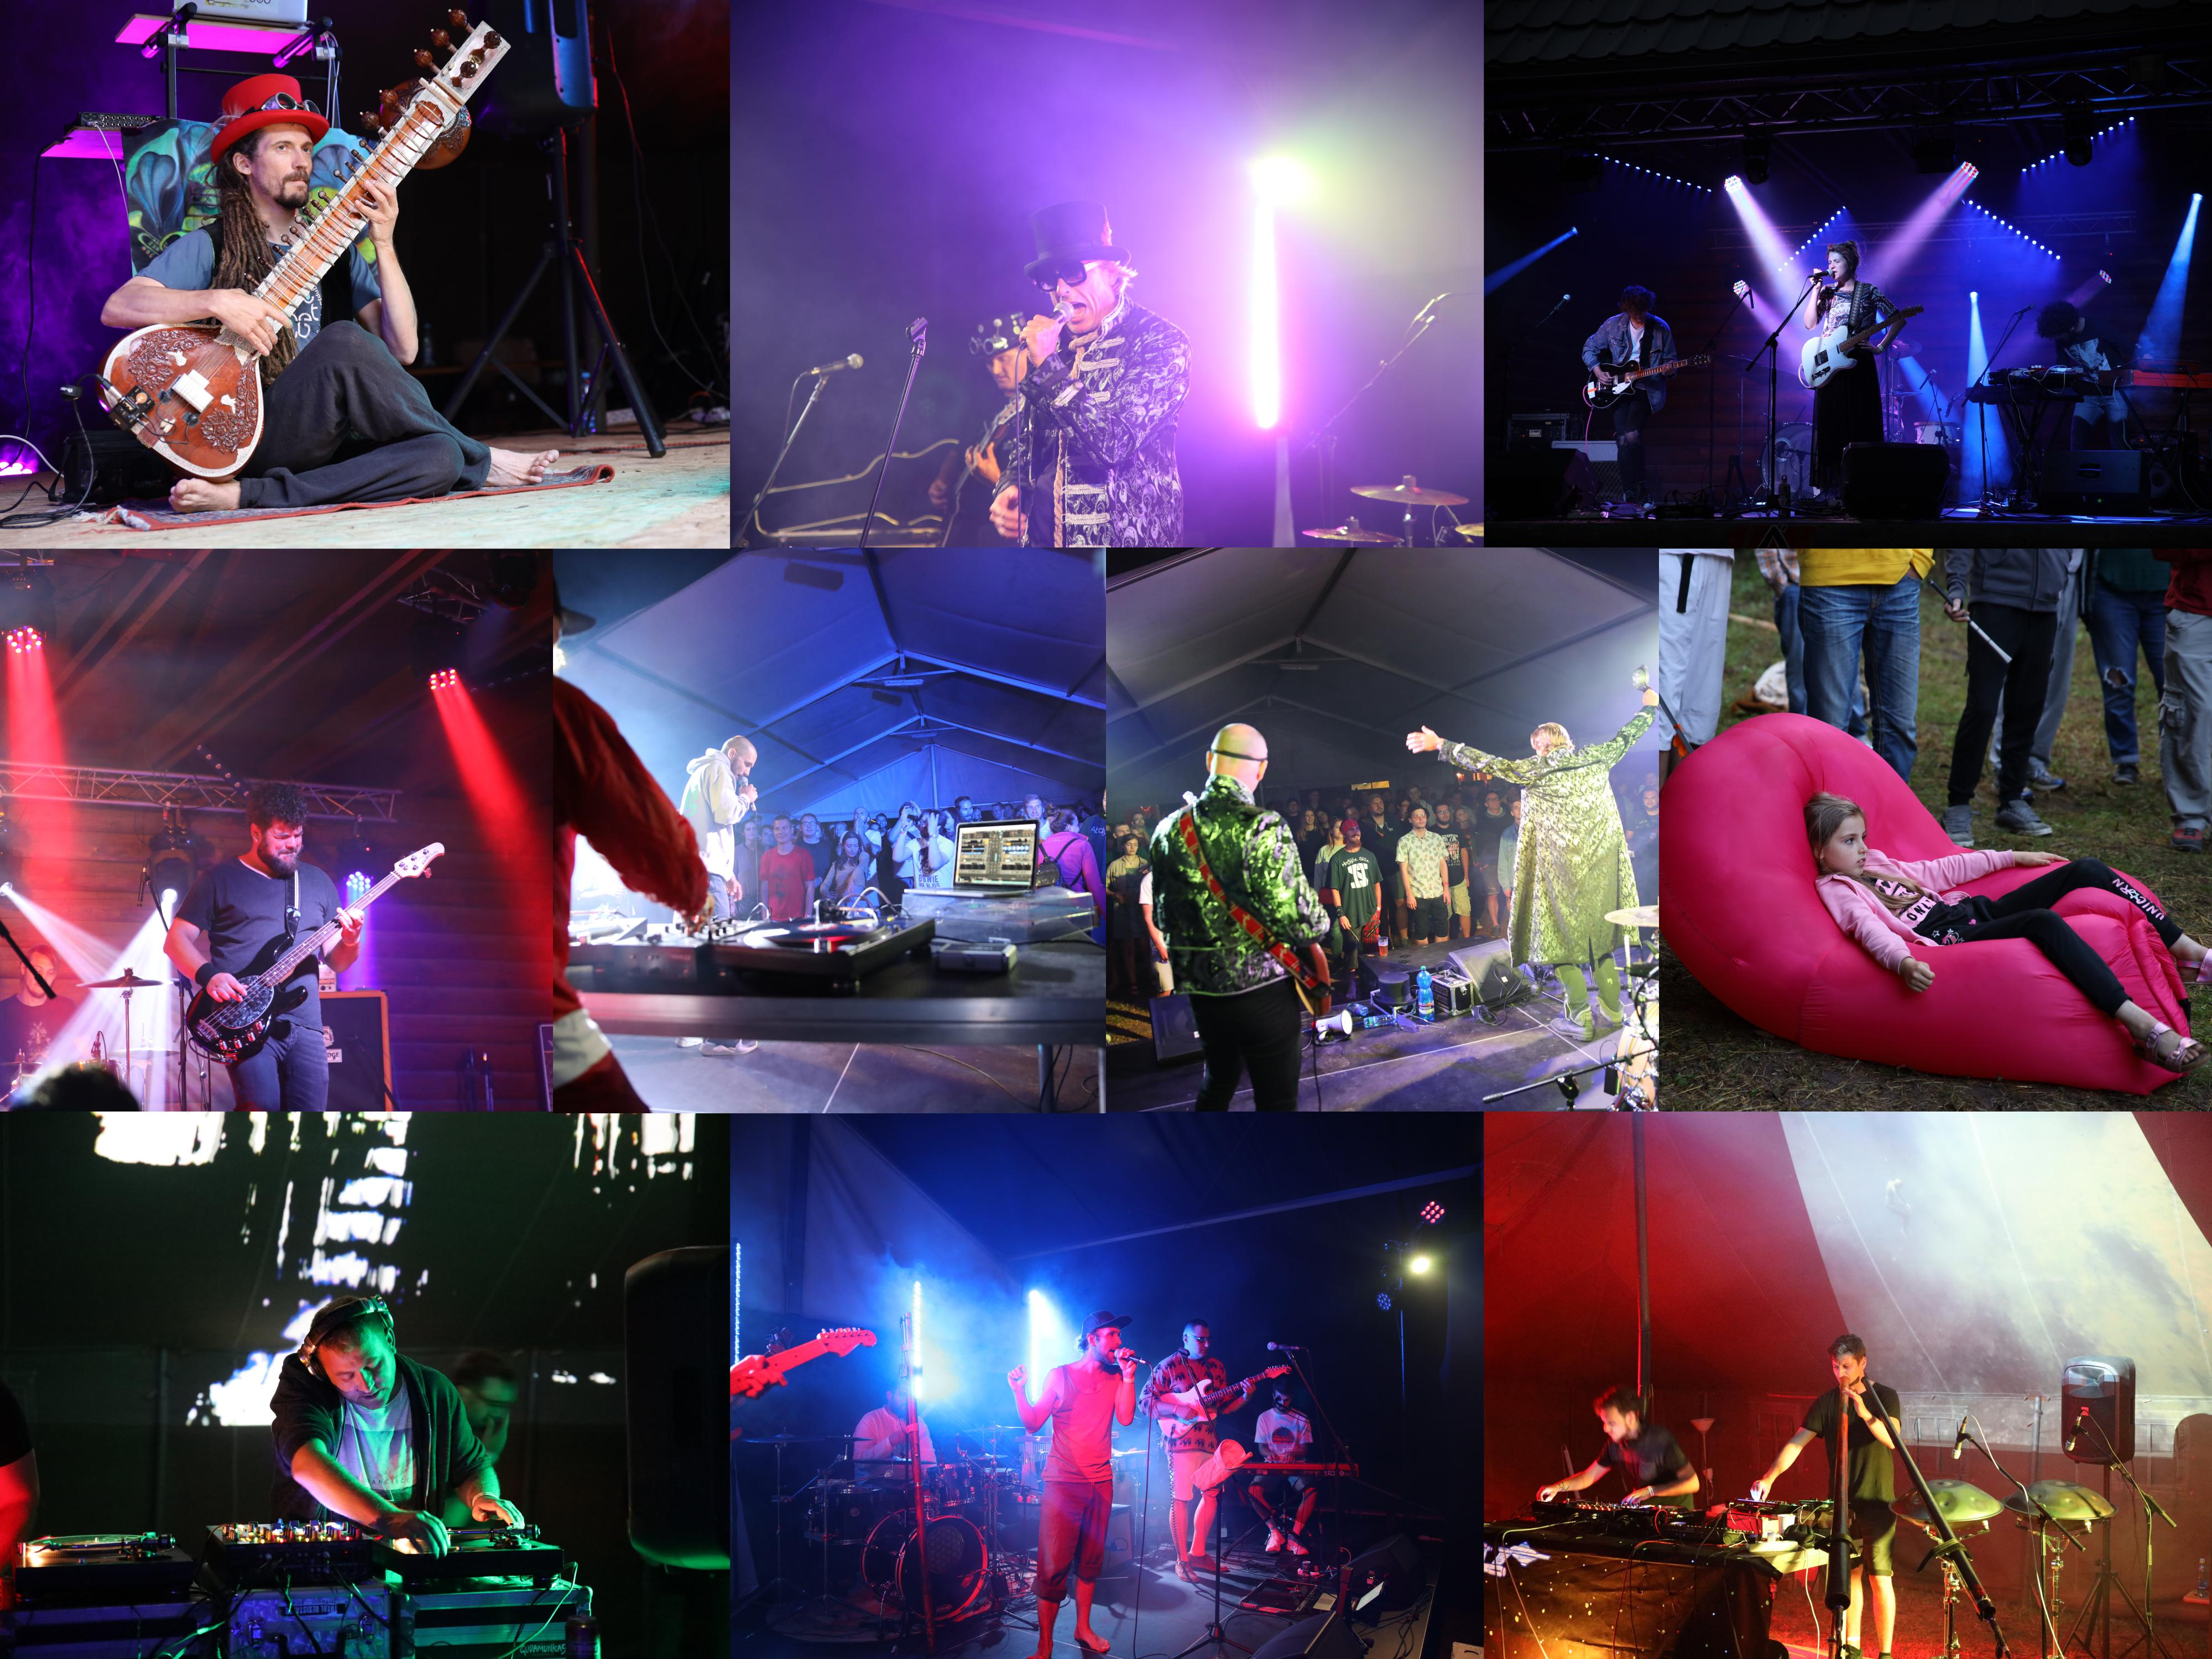 Foto: Festival Tužina Groove 2019